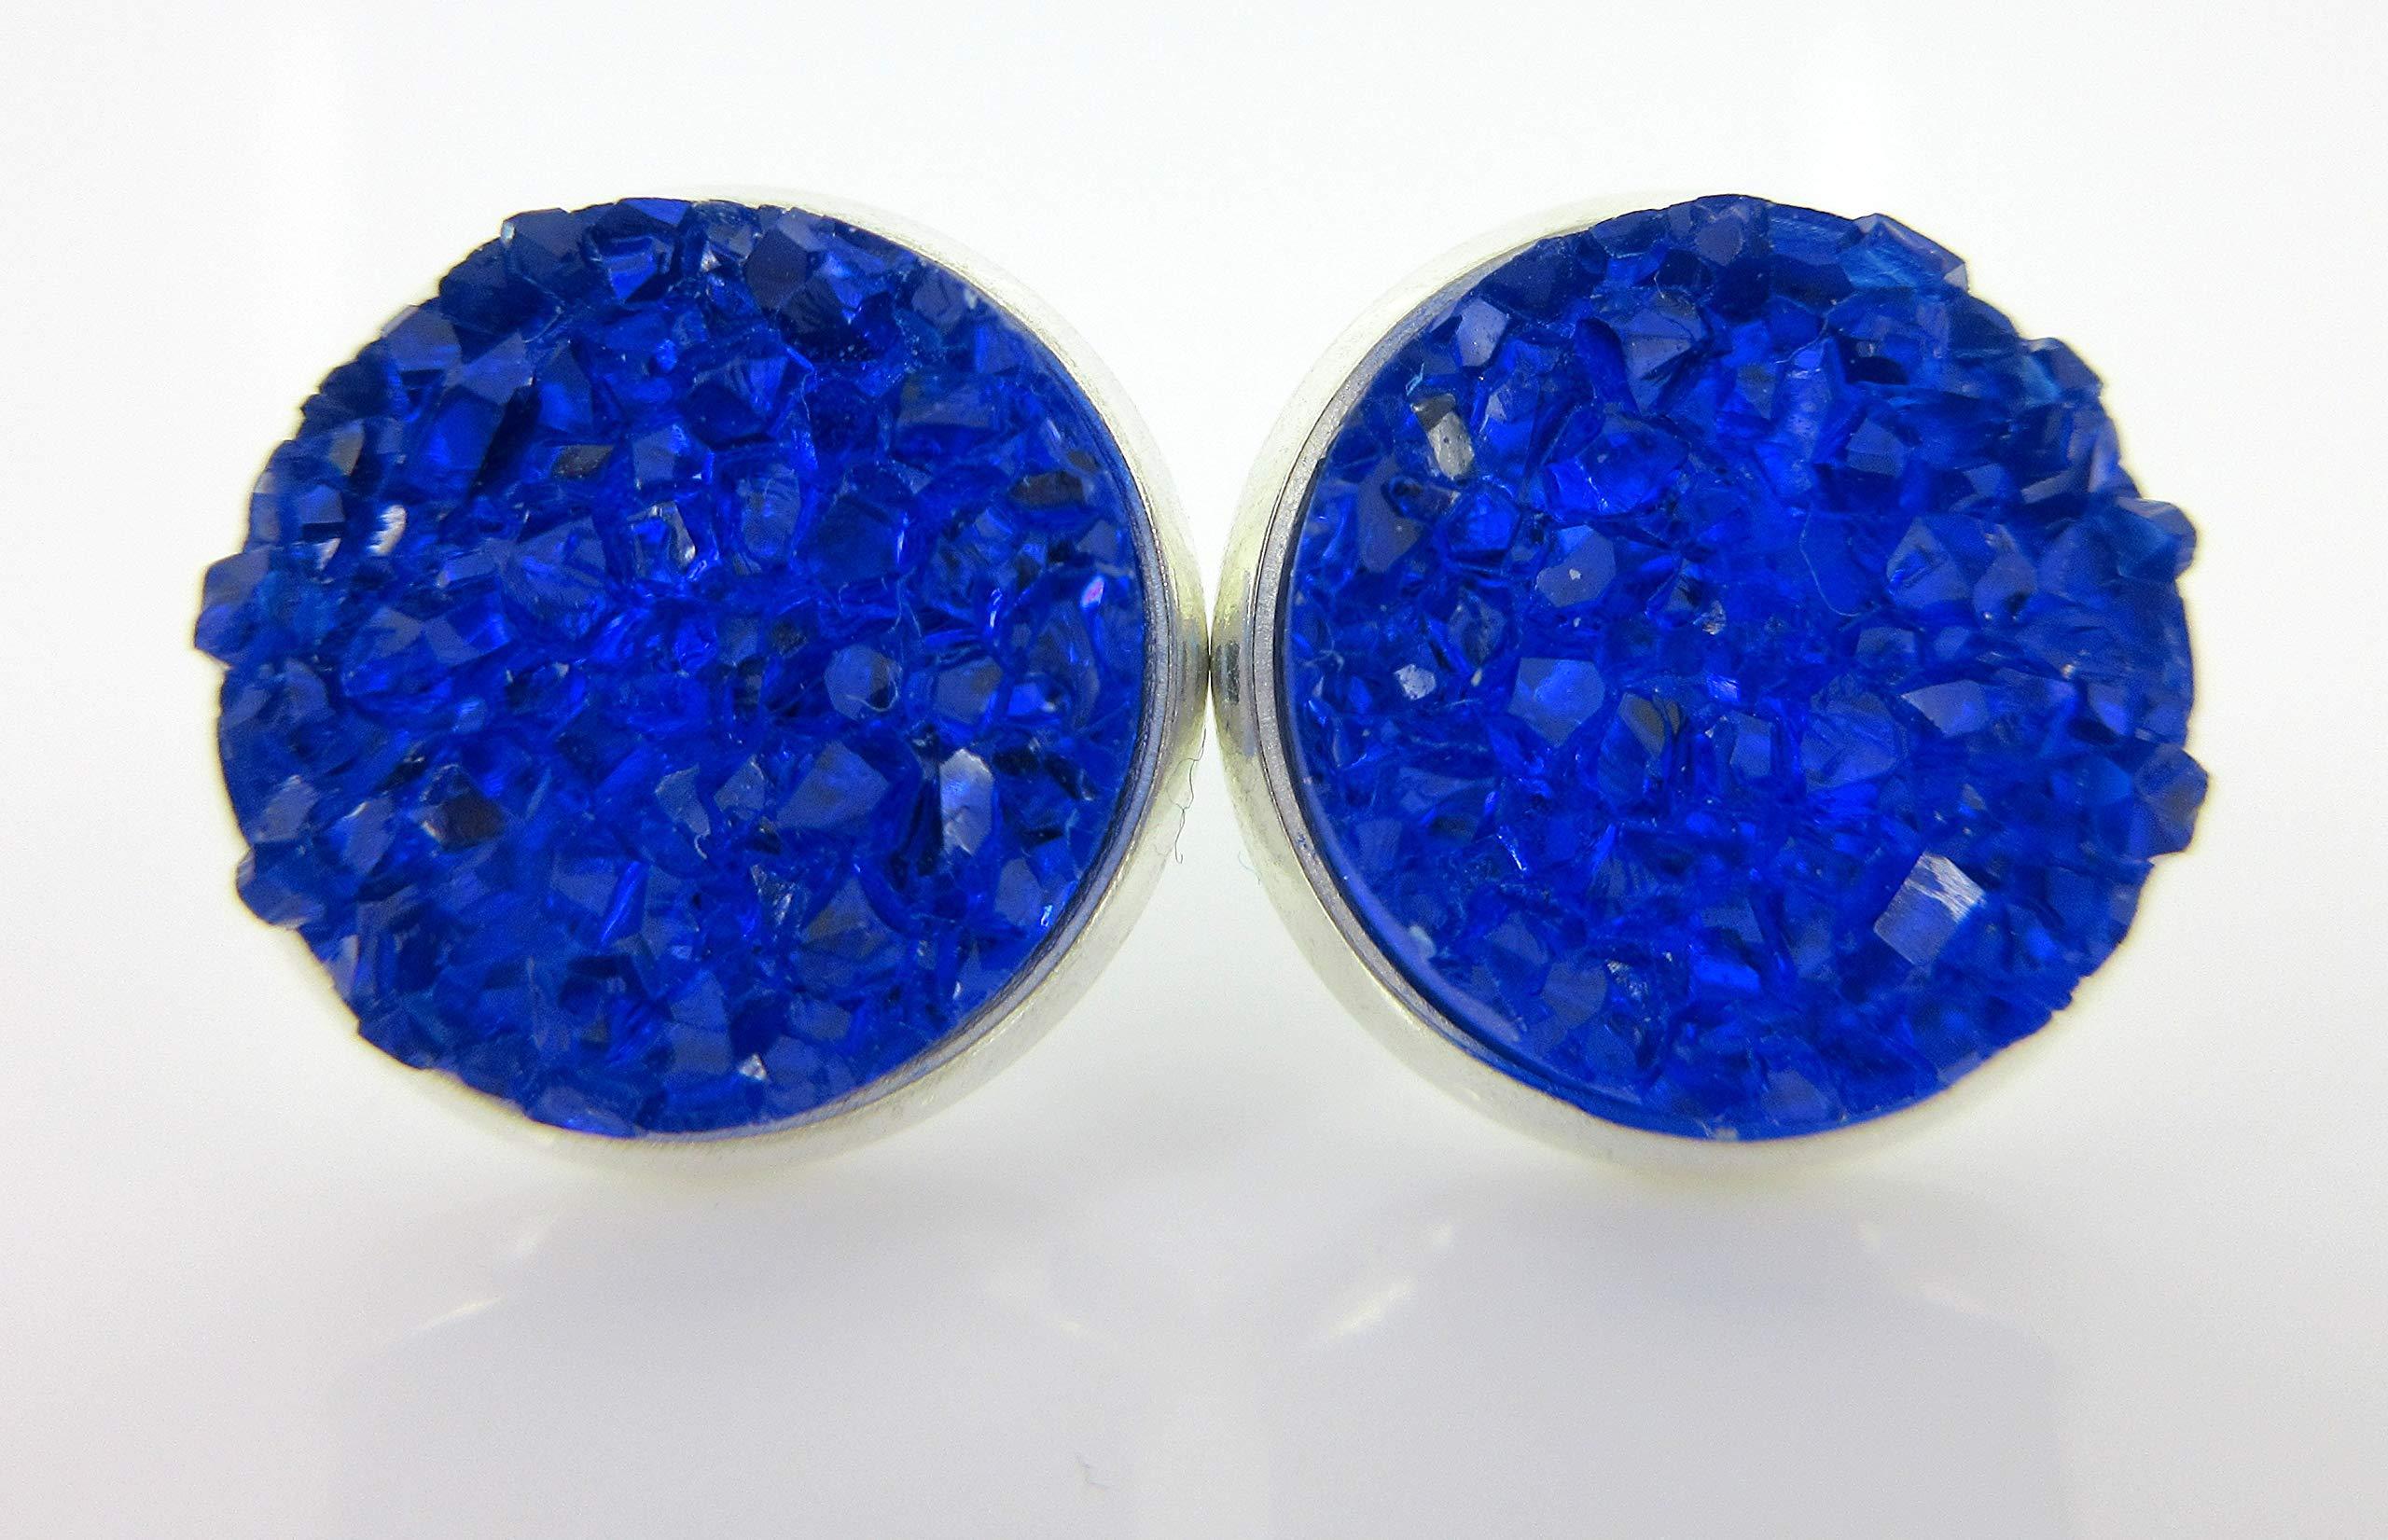 Trio Silver-tone Stud Earrings Clear AB Red Faux Druzy Stone Mermaid Scale Set 12mm